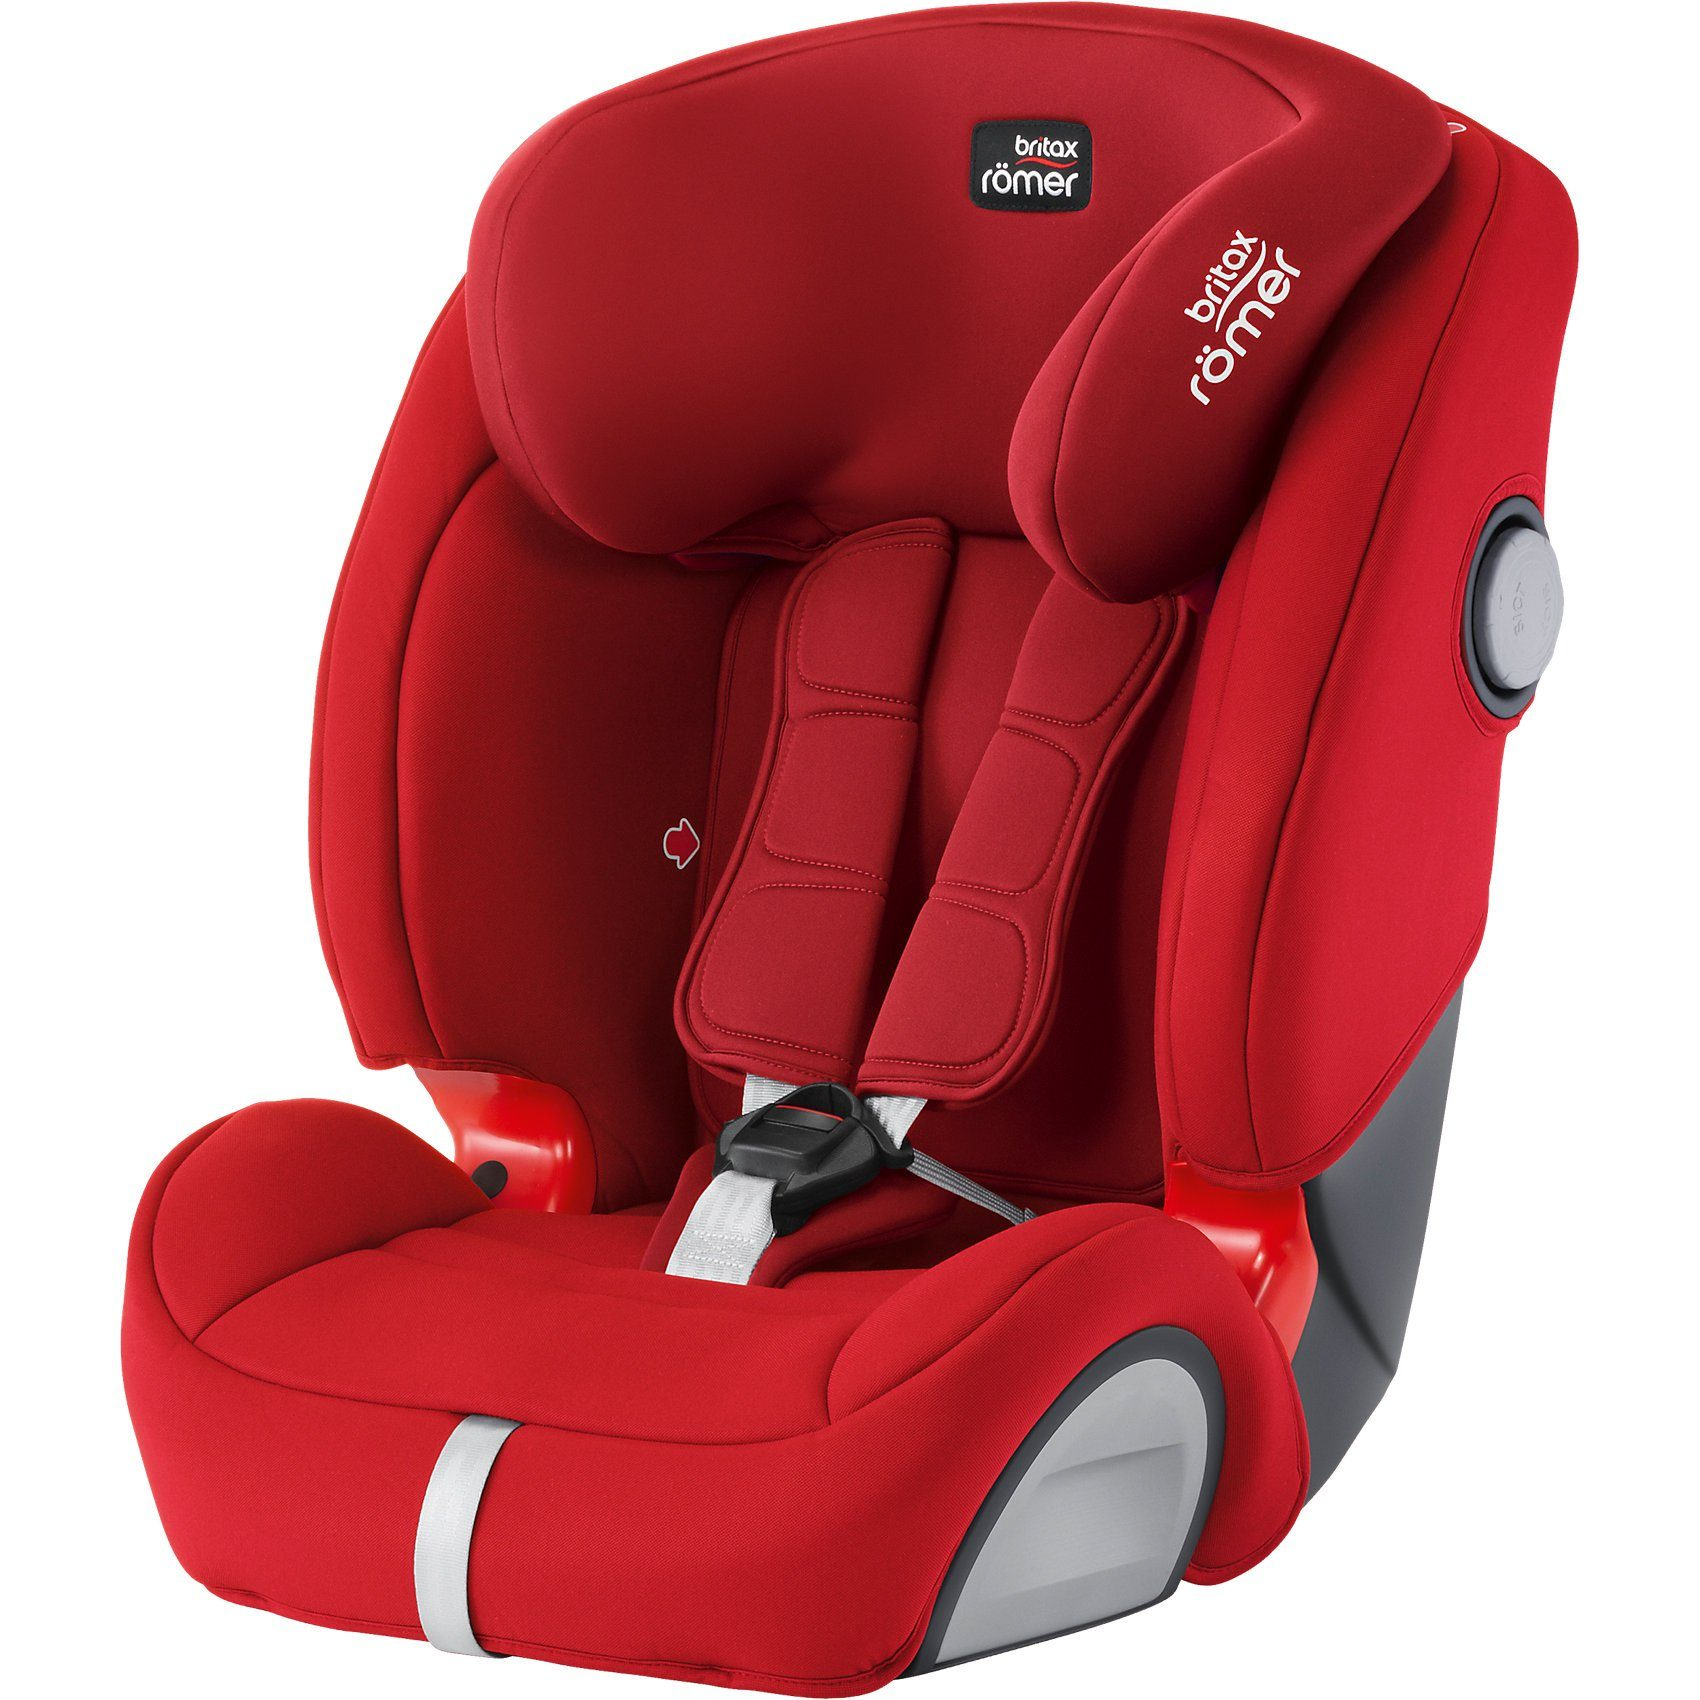 Britax Römer Auto-Kindersitz Evolva 1-2-3 SL SICT, Flame Red, 2017